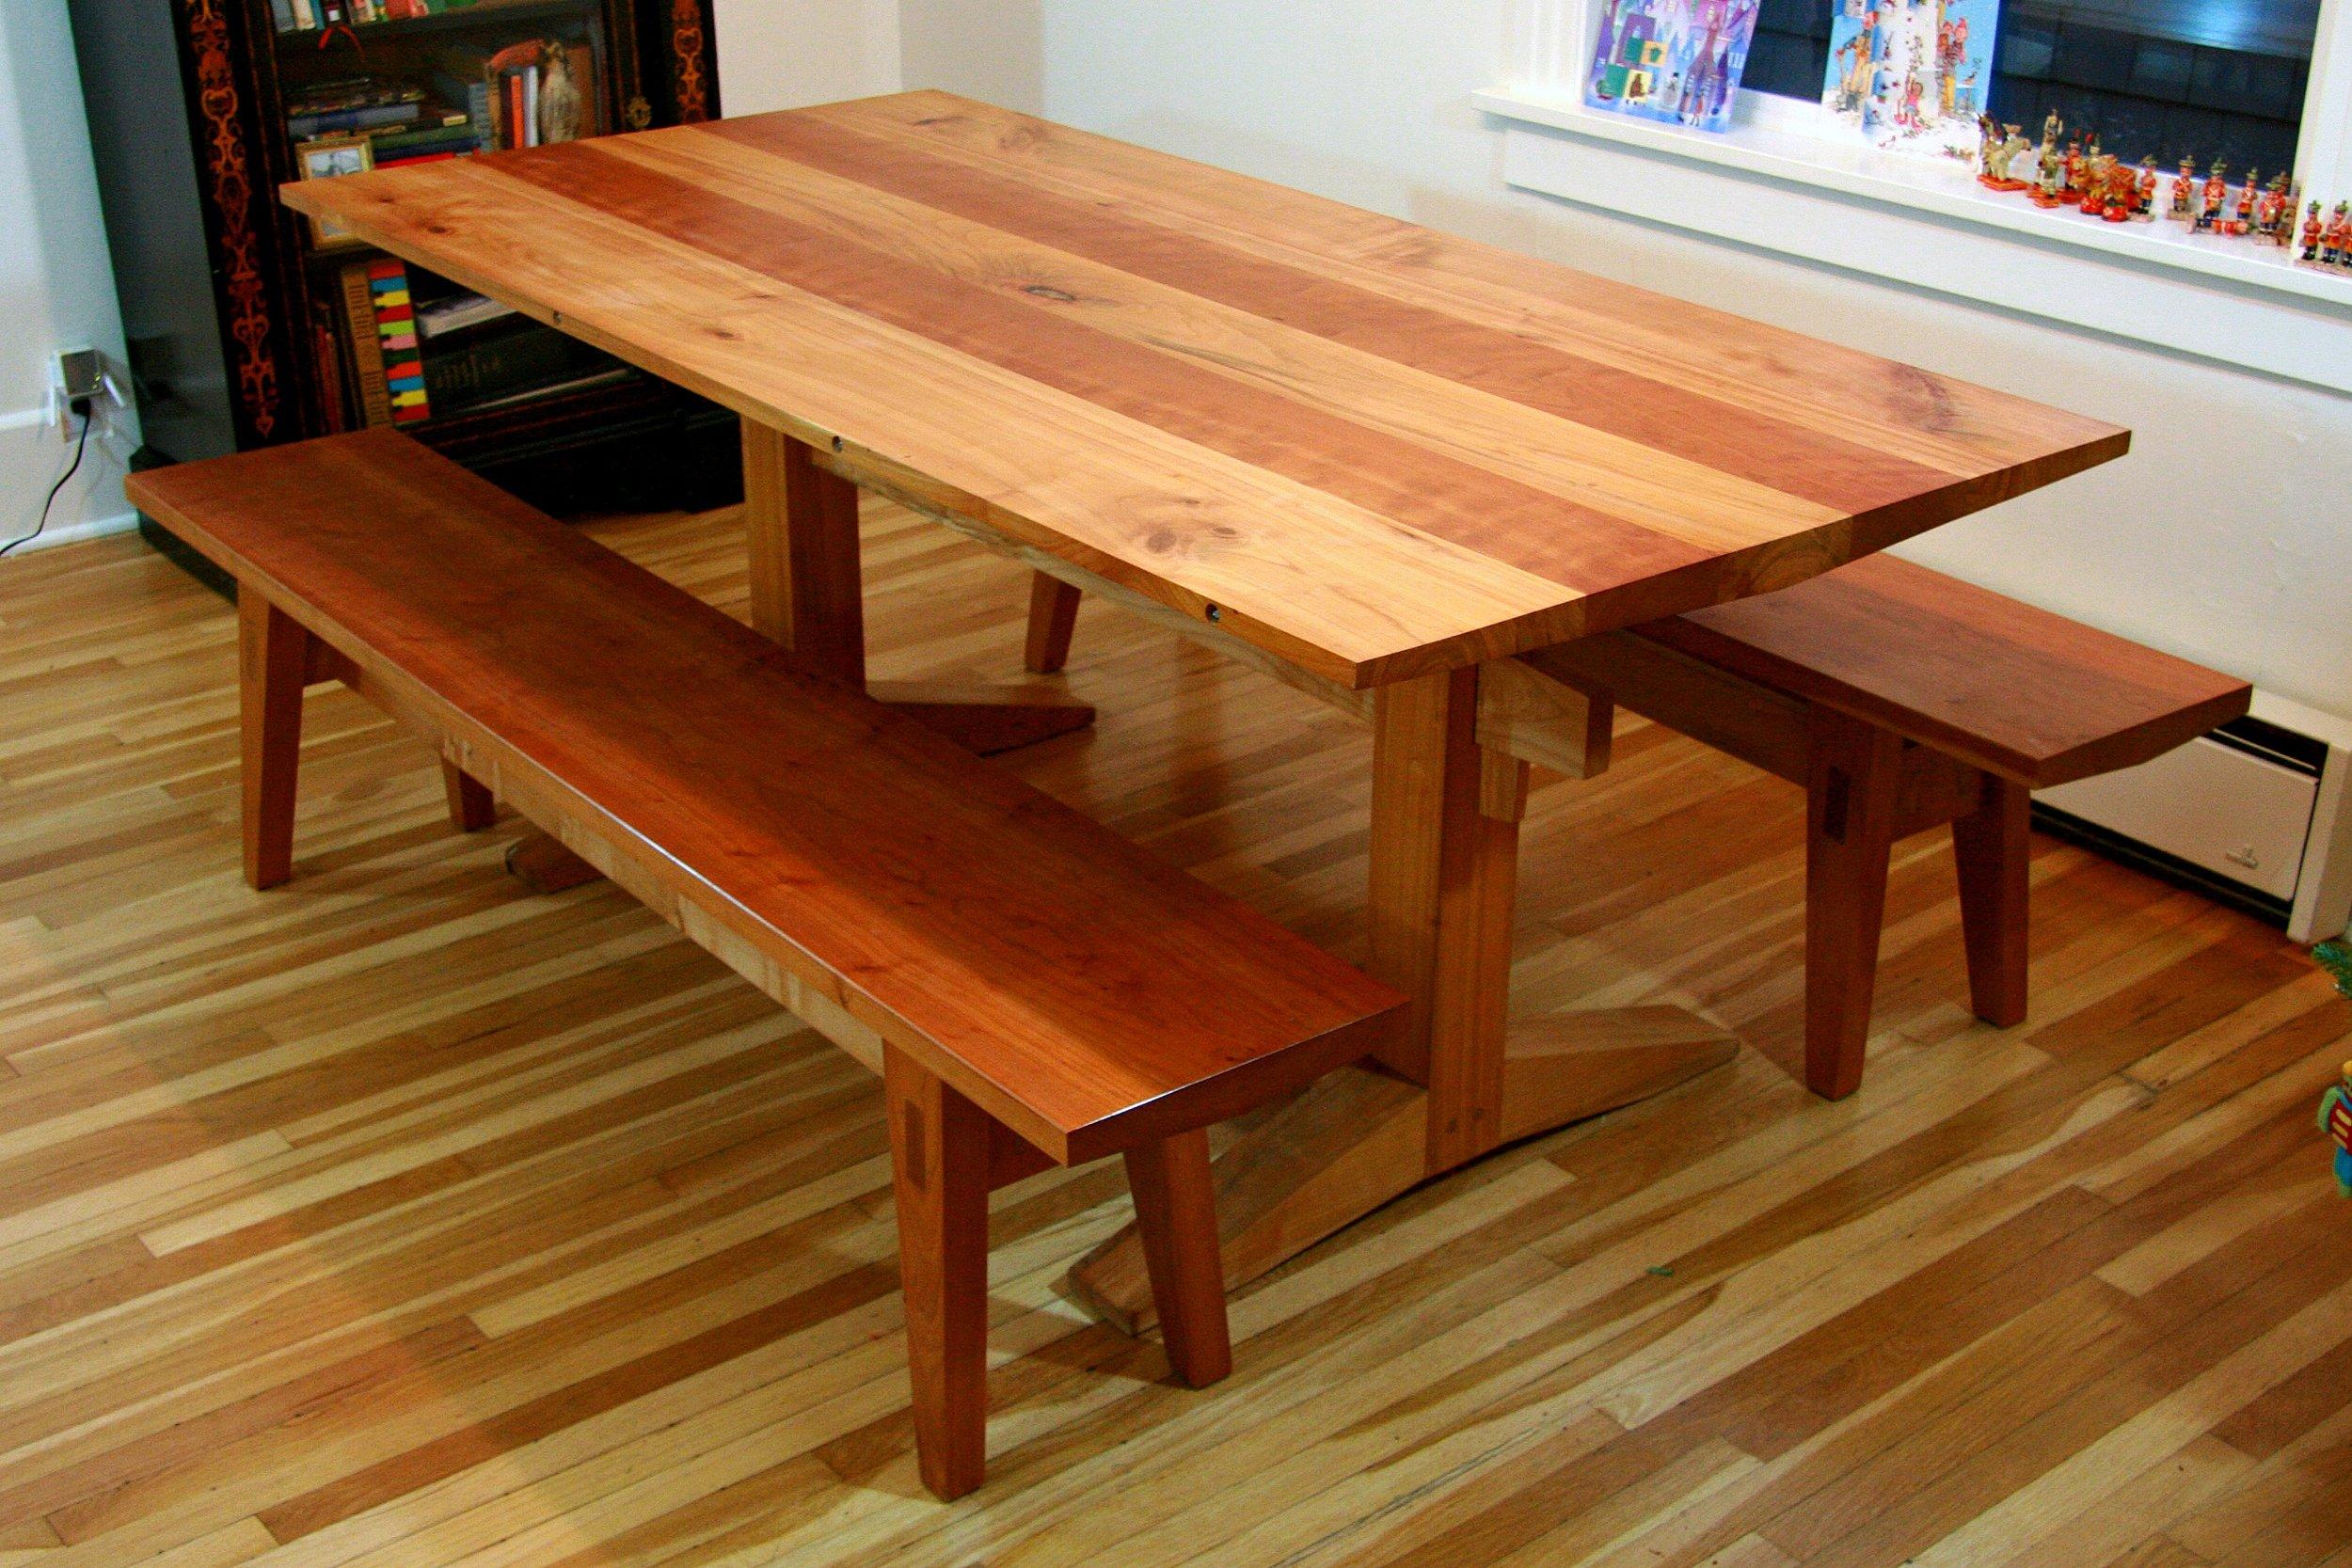 cherry-trestle-table_23951605021_o.jpg